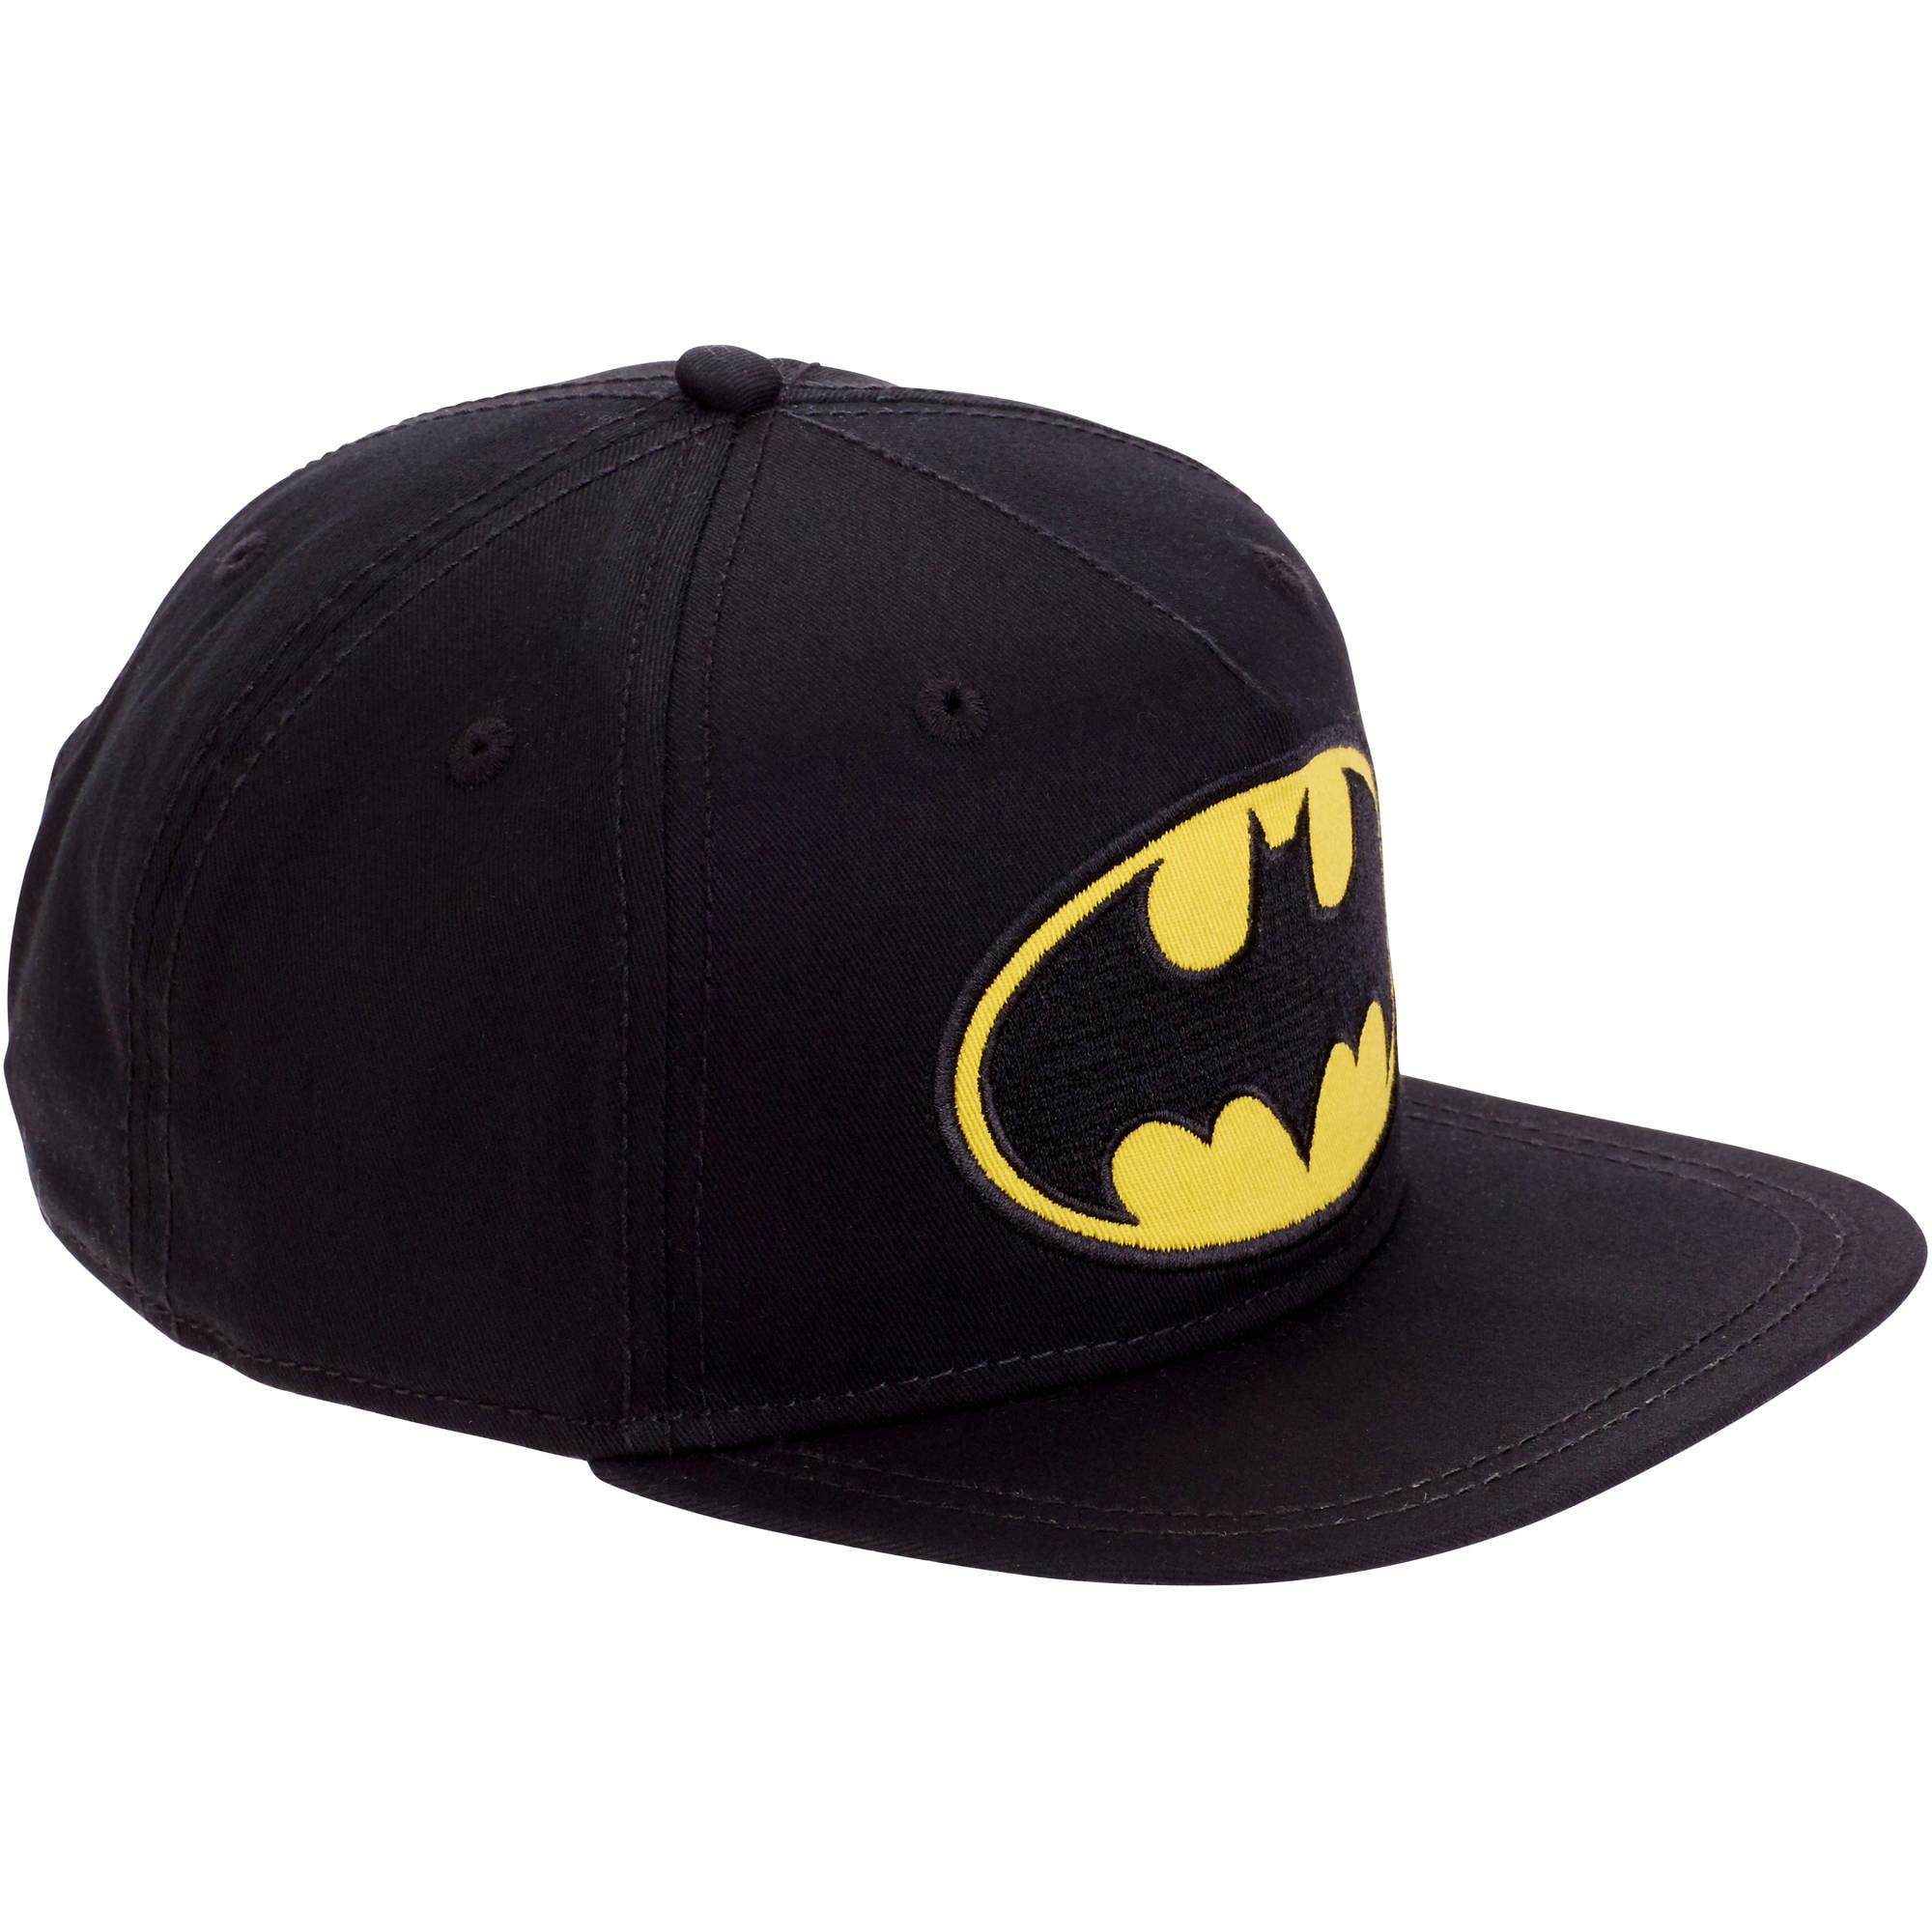 Boy's Black Flat Bill Hat with Batman Emblem